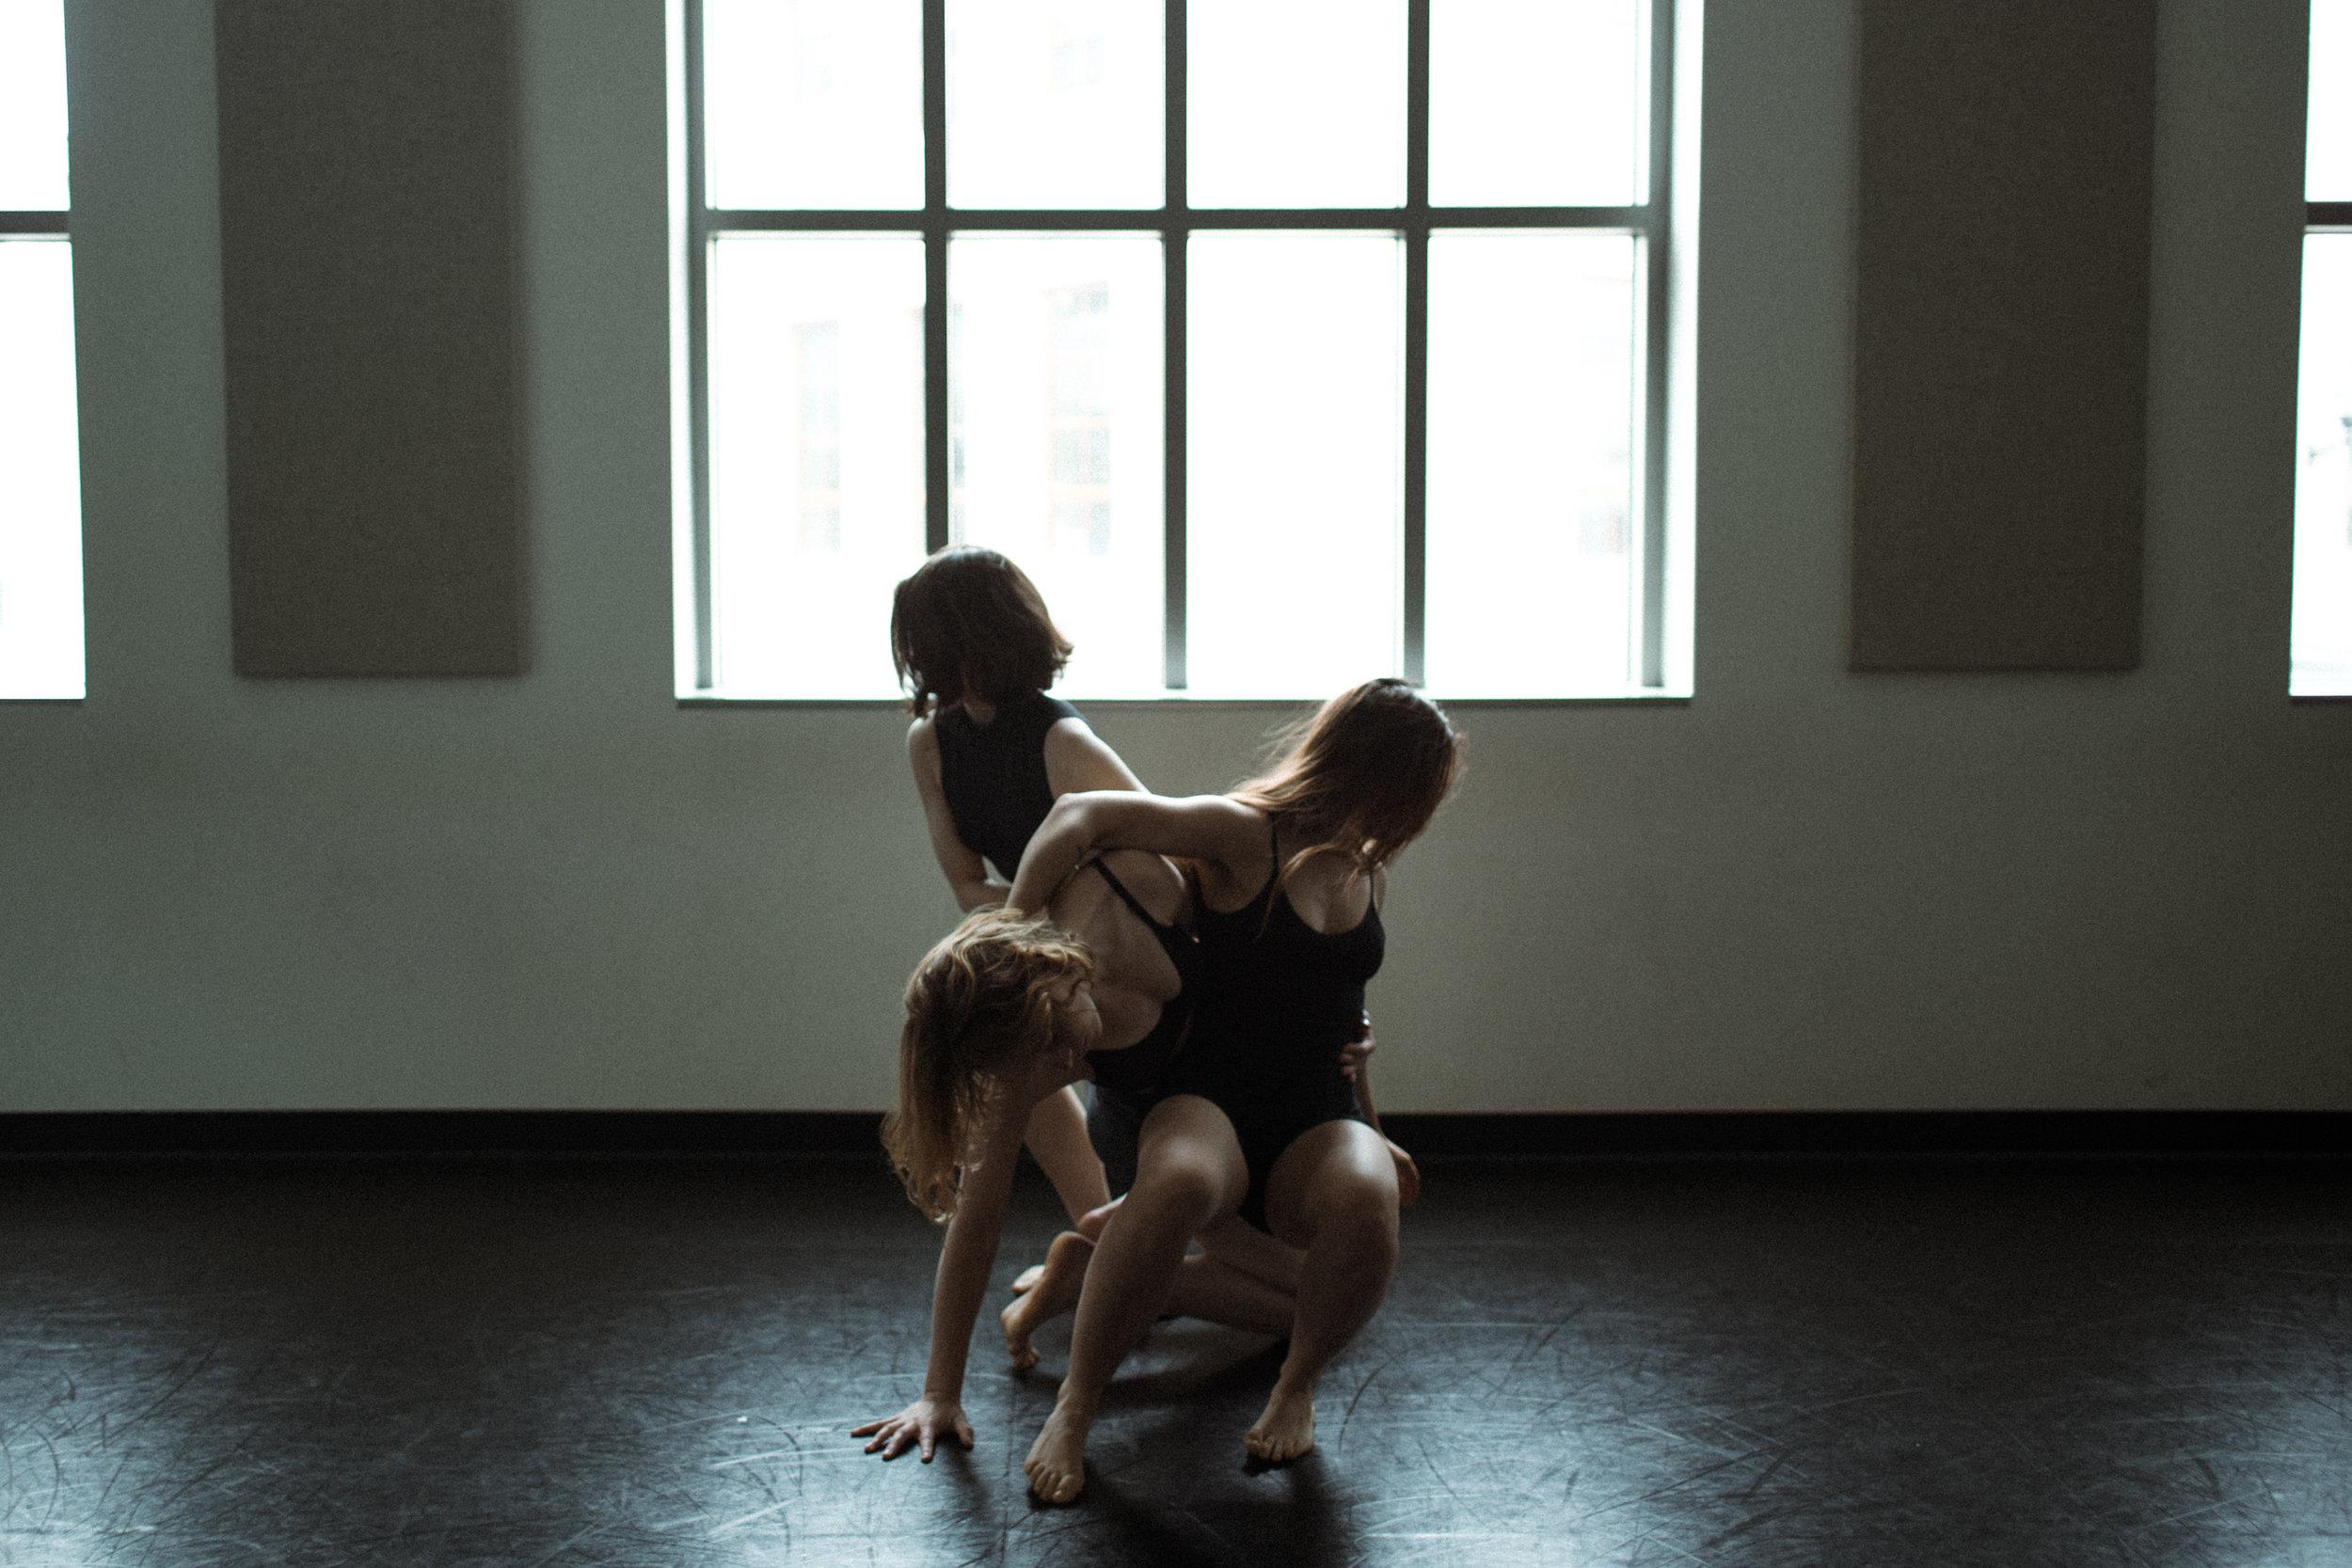 dancers of ohio state university dance program sullivant hall dance portraits by iamsarahrose sarah rose dance photographer in columbus ohio